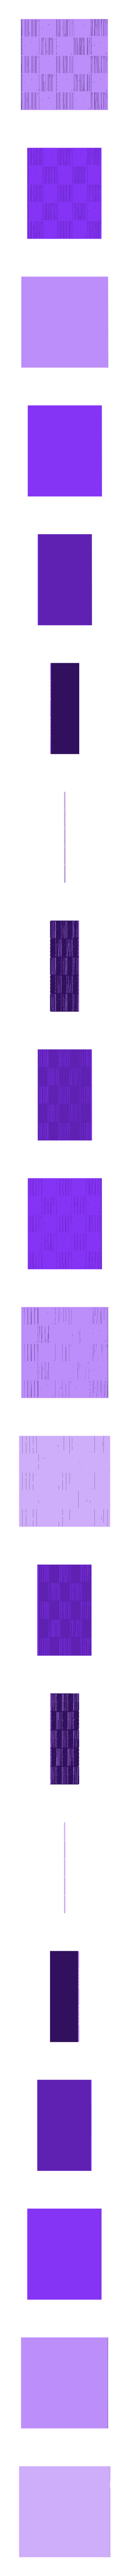 5X5_minimal_wood_floor.stl Download free STL file Minimalist Flooring • 3D printer template, mrhers2